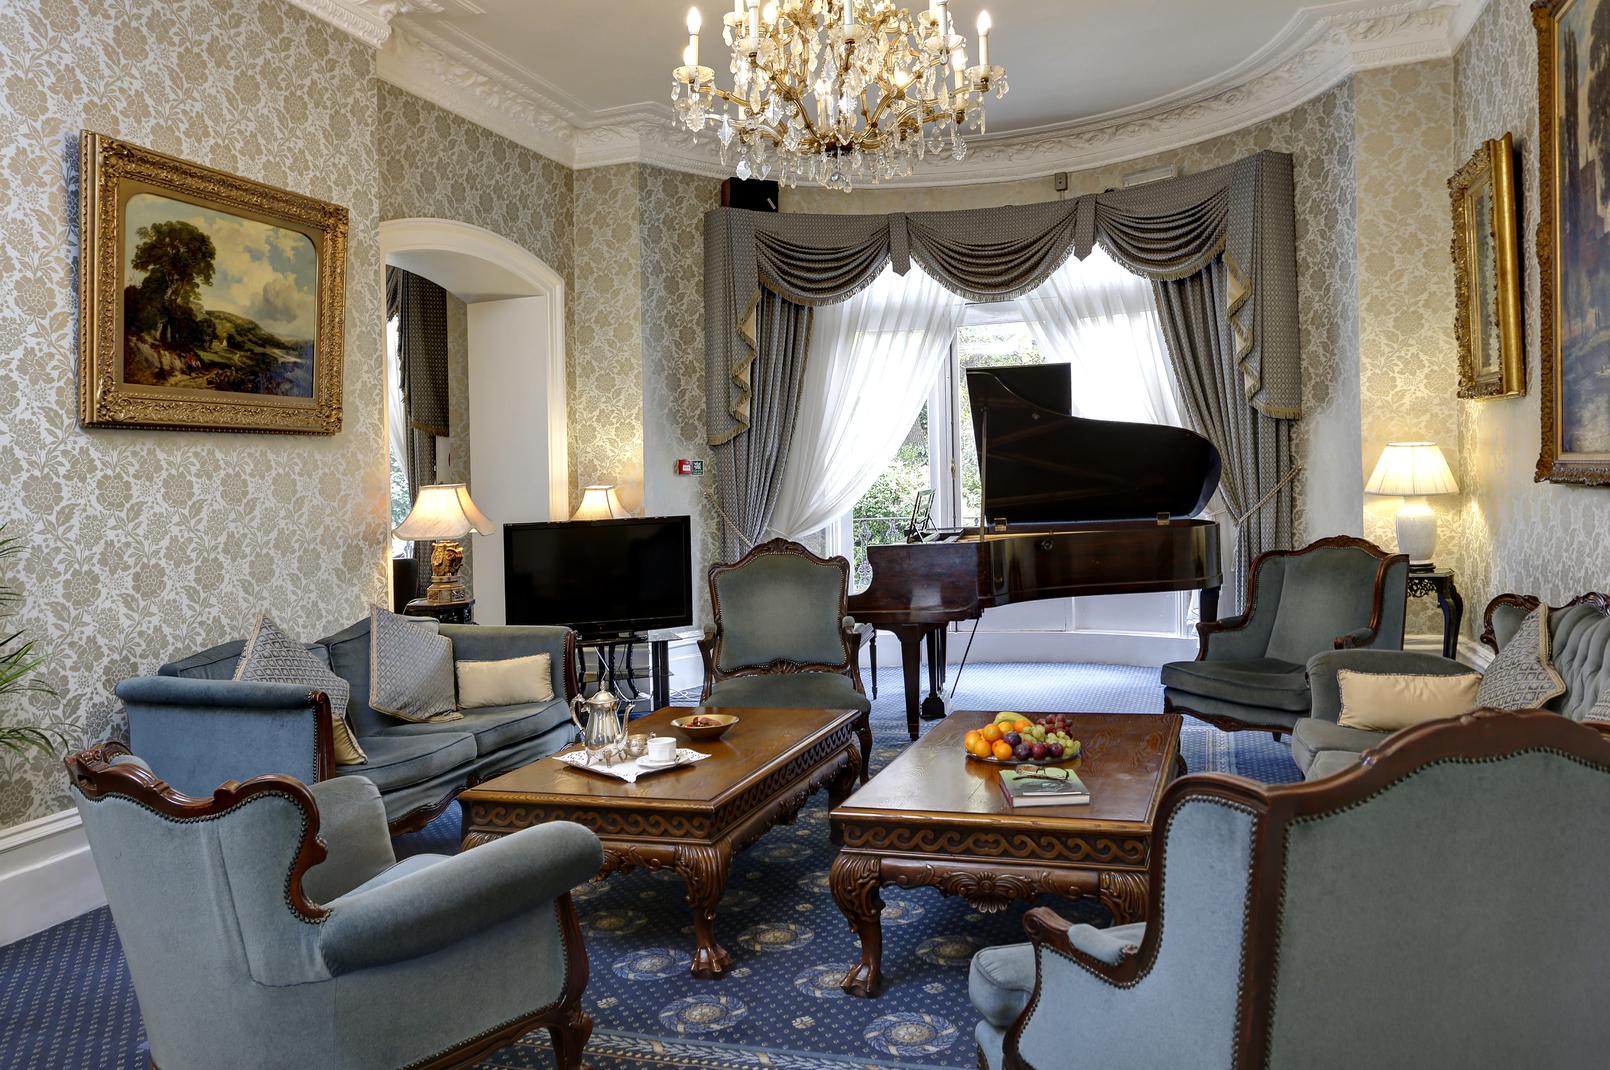 best western swiss cottage hotel rh bestwestern co uk best western swiss cottage londres best western swiss cottage telephone